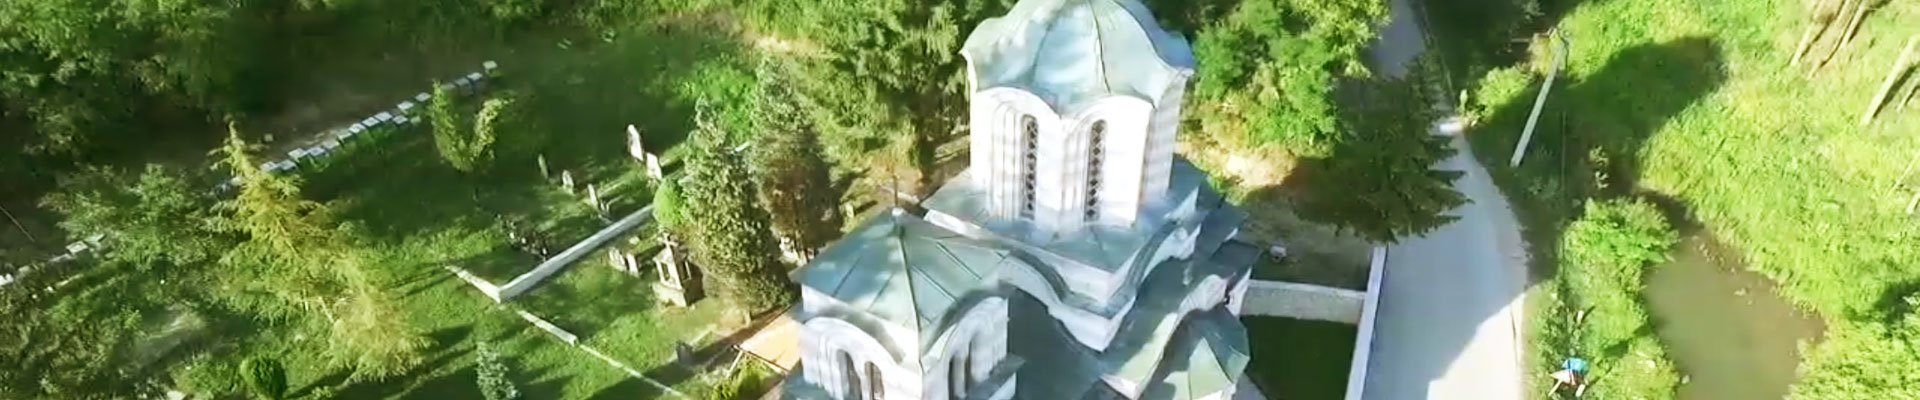 Manastir Tumane, Srbija